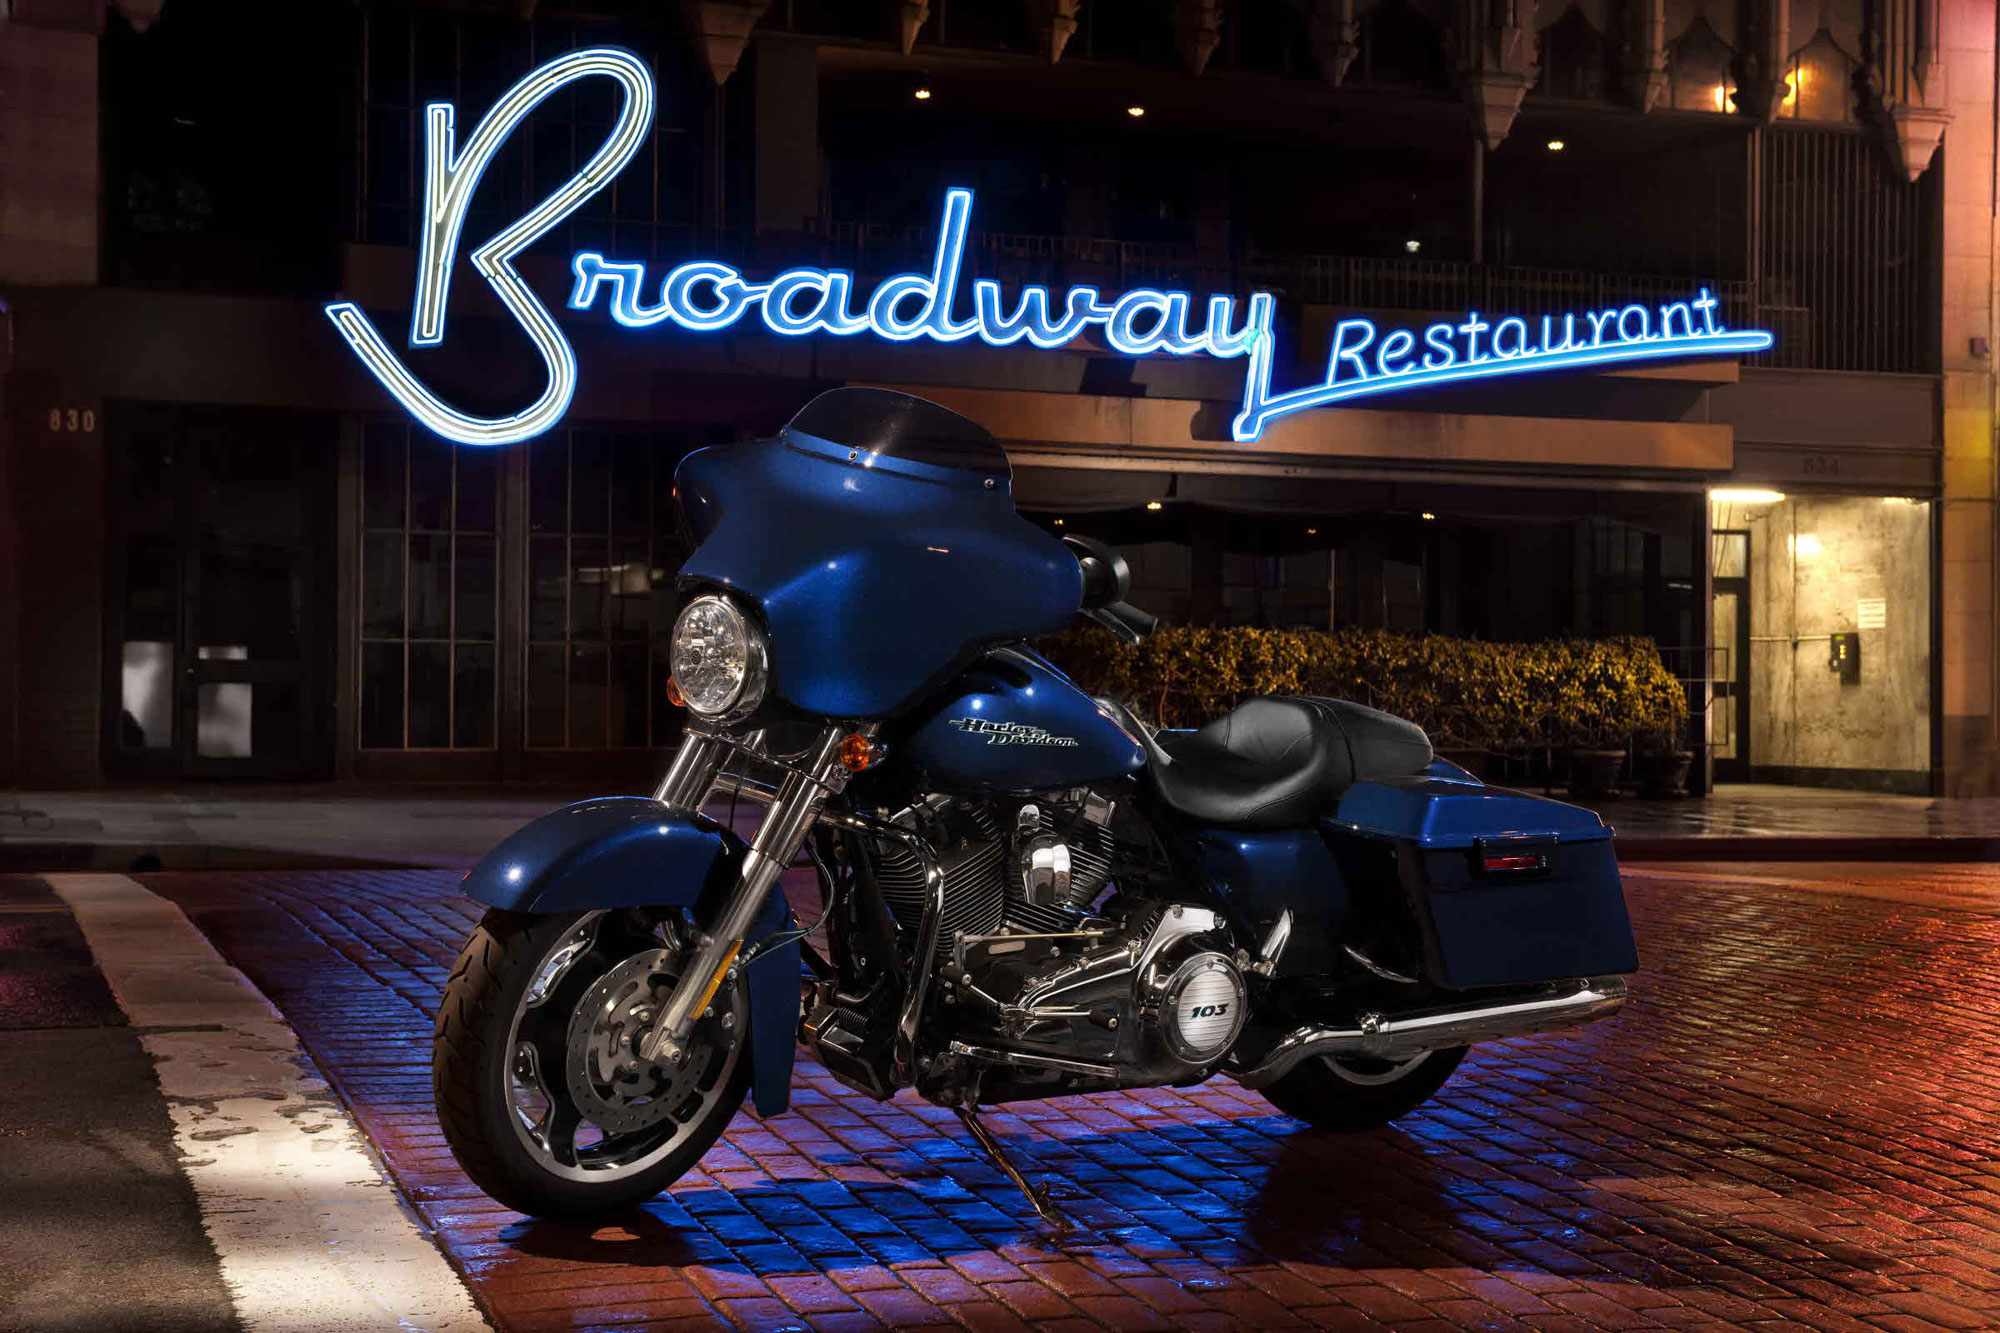 2012 Harley Davidson Flhx Street Glide Wallpaper 2000x1333